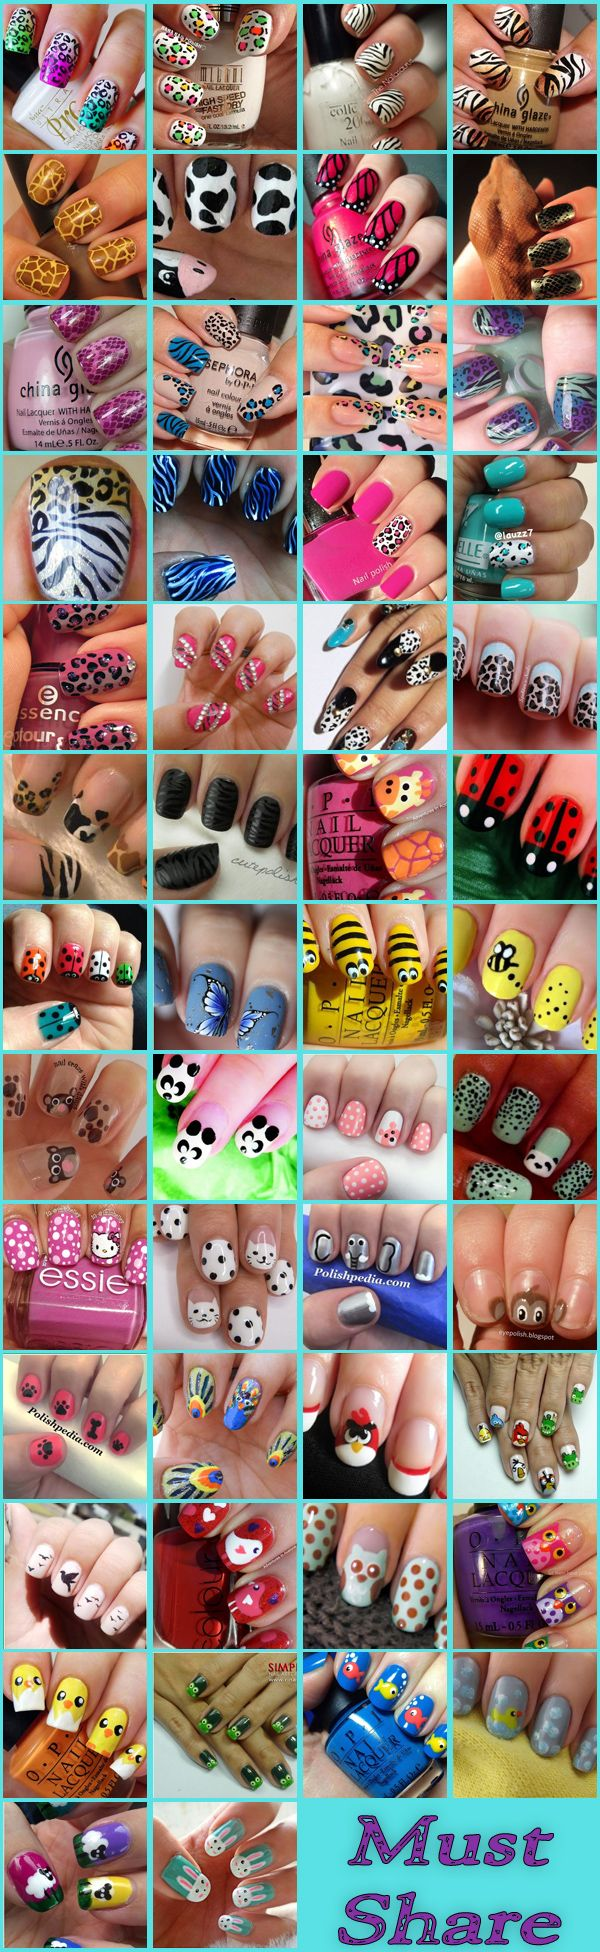 50 Animal Themed Nail Art Designs To Inspire You - Nagel, Nagellak ...